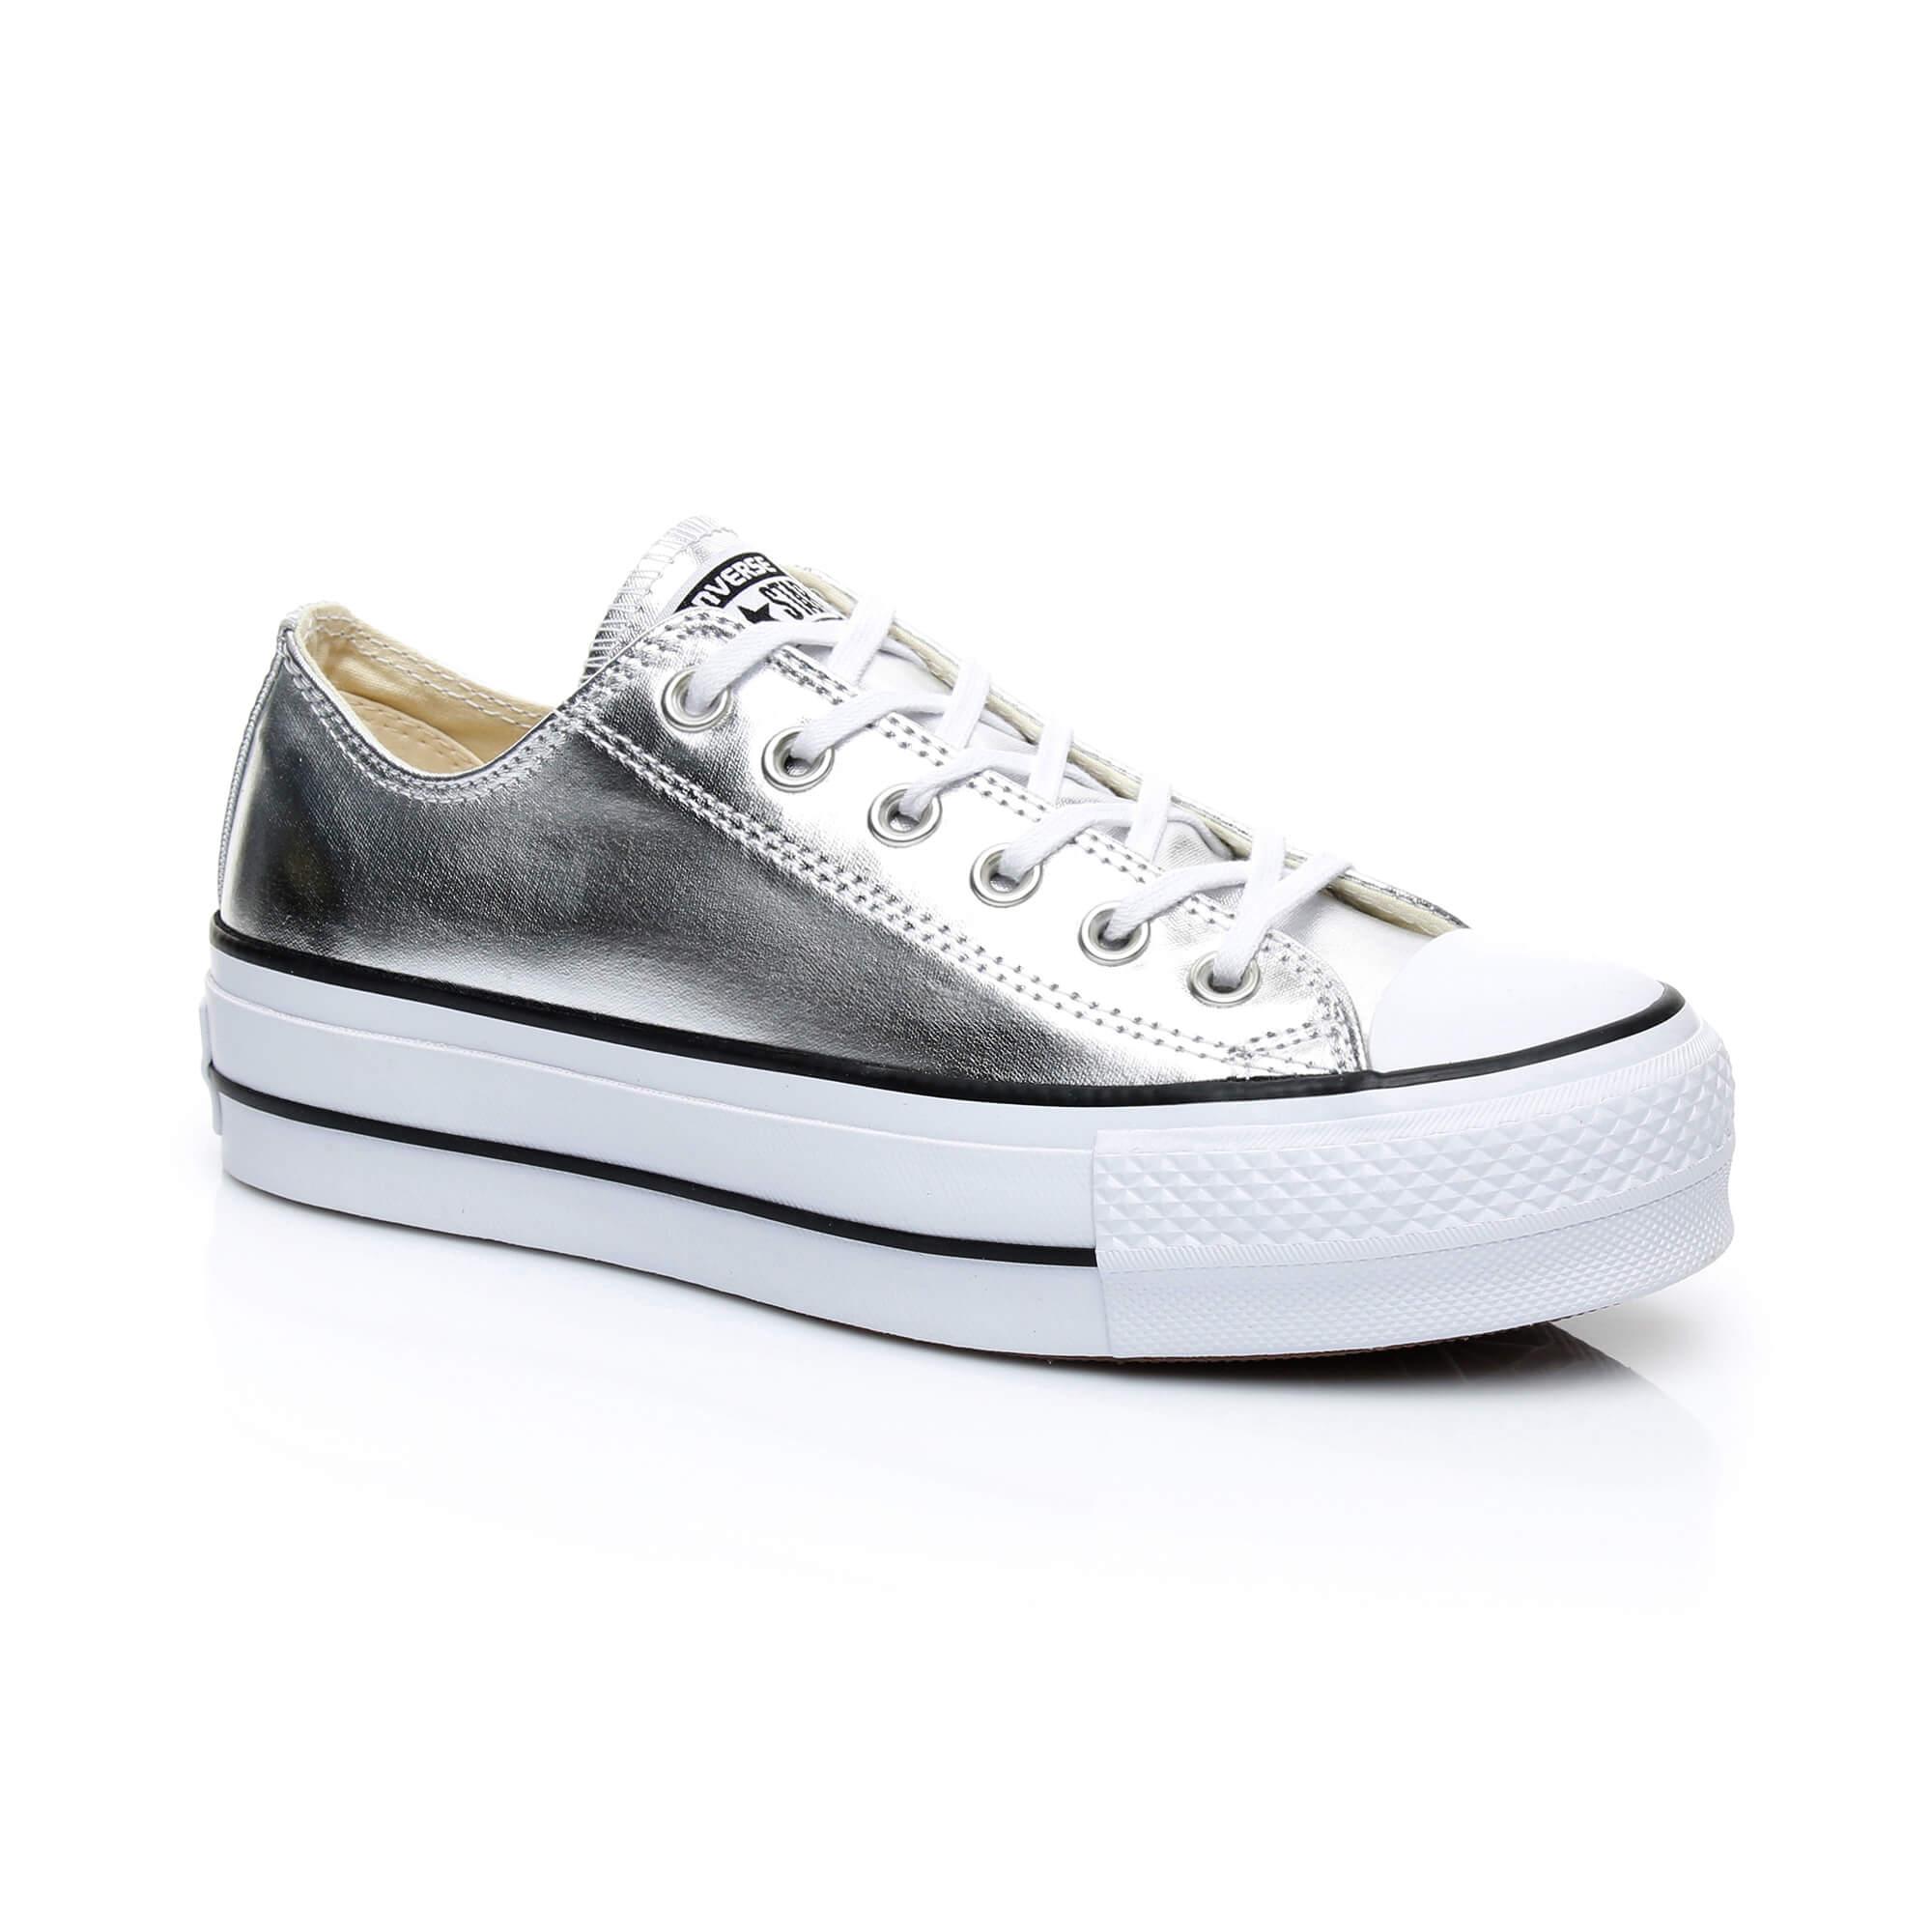 Converse Chuck Taylor All Star Lift Kadın Gümüş Sneaker